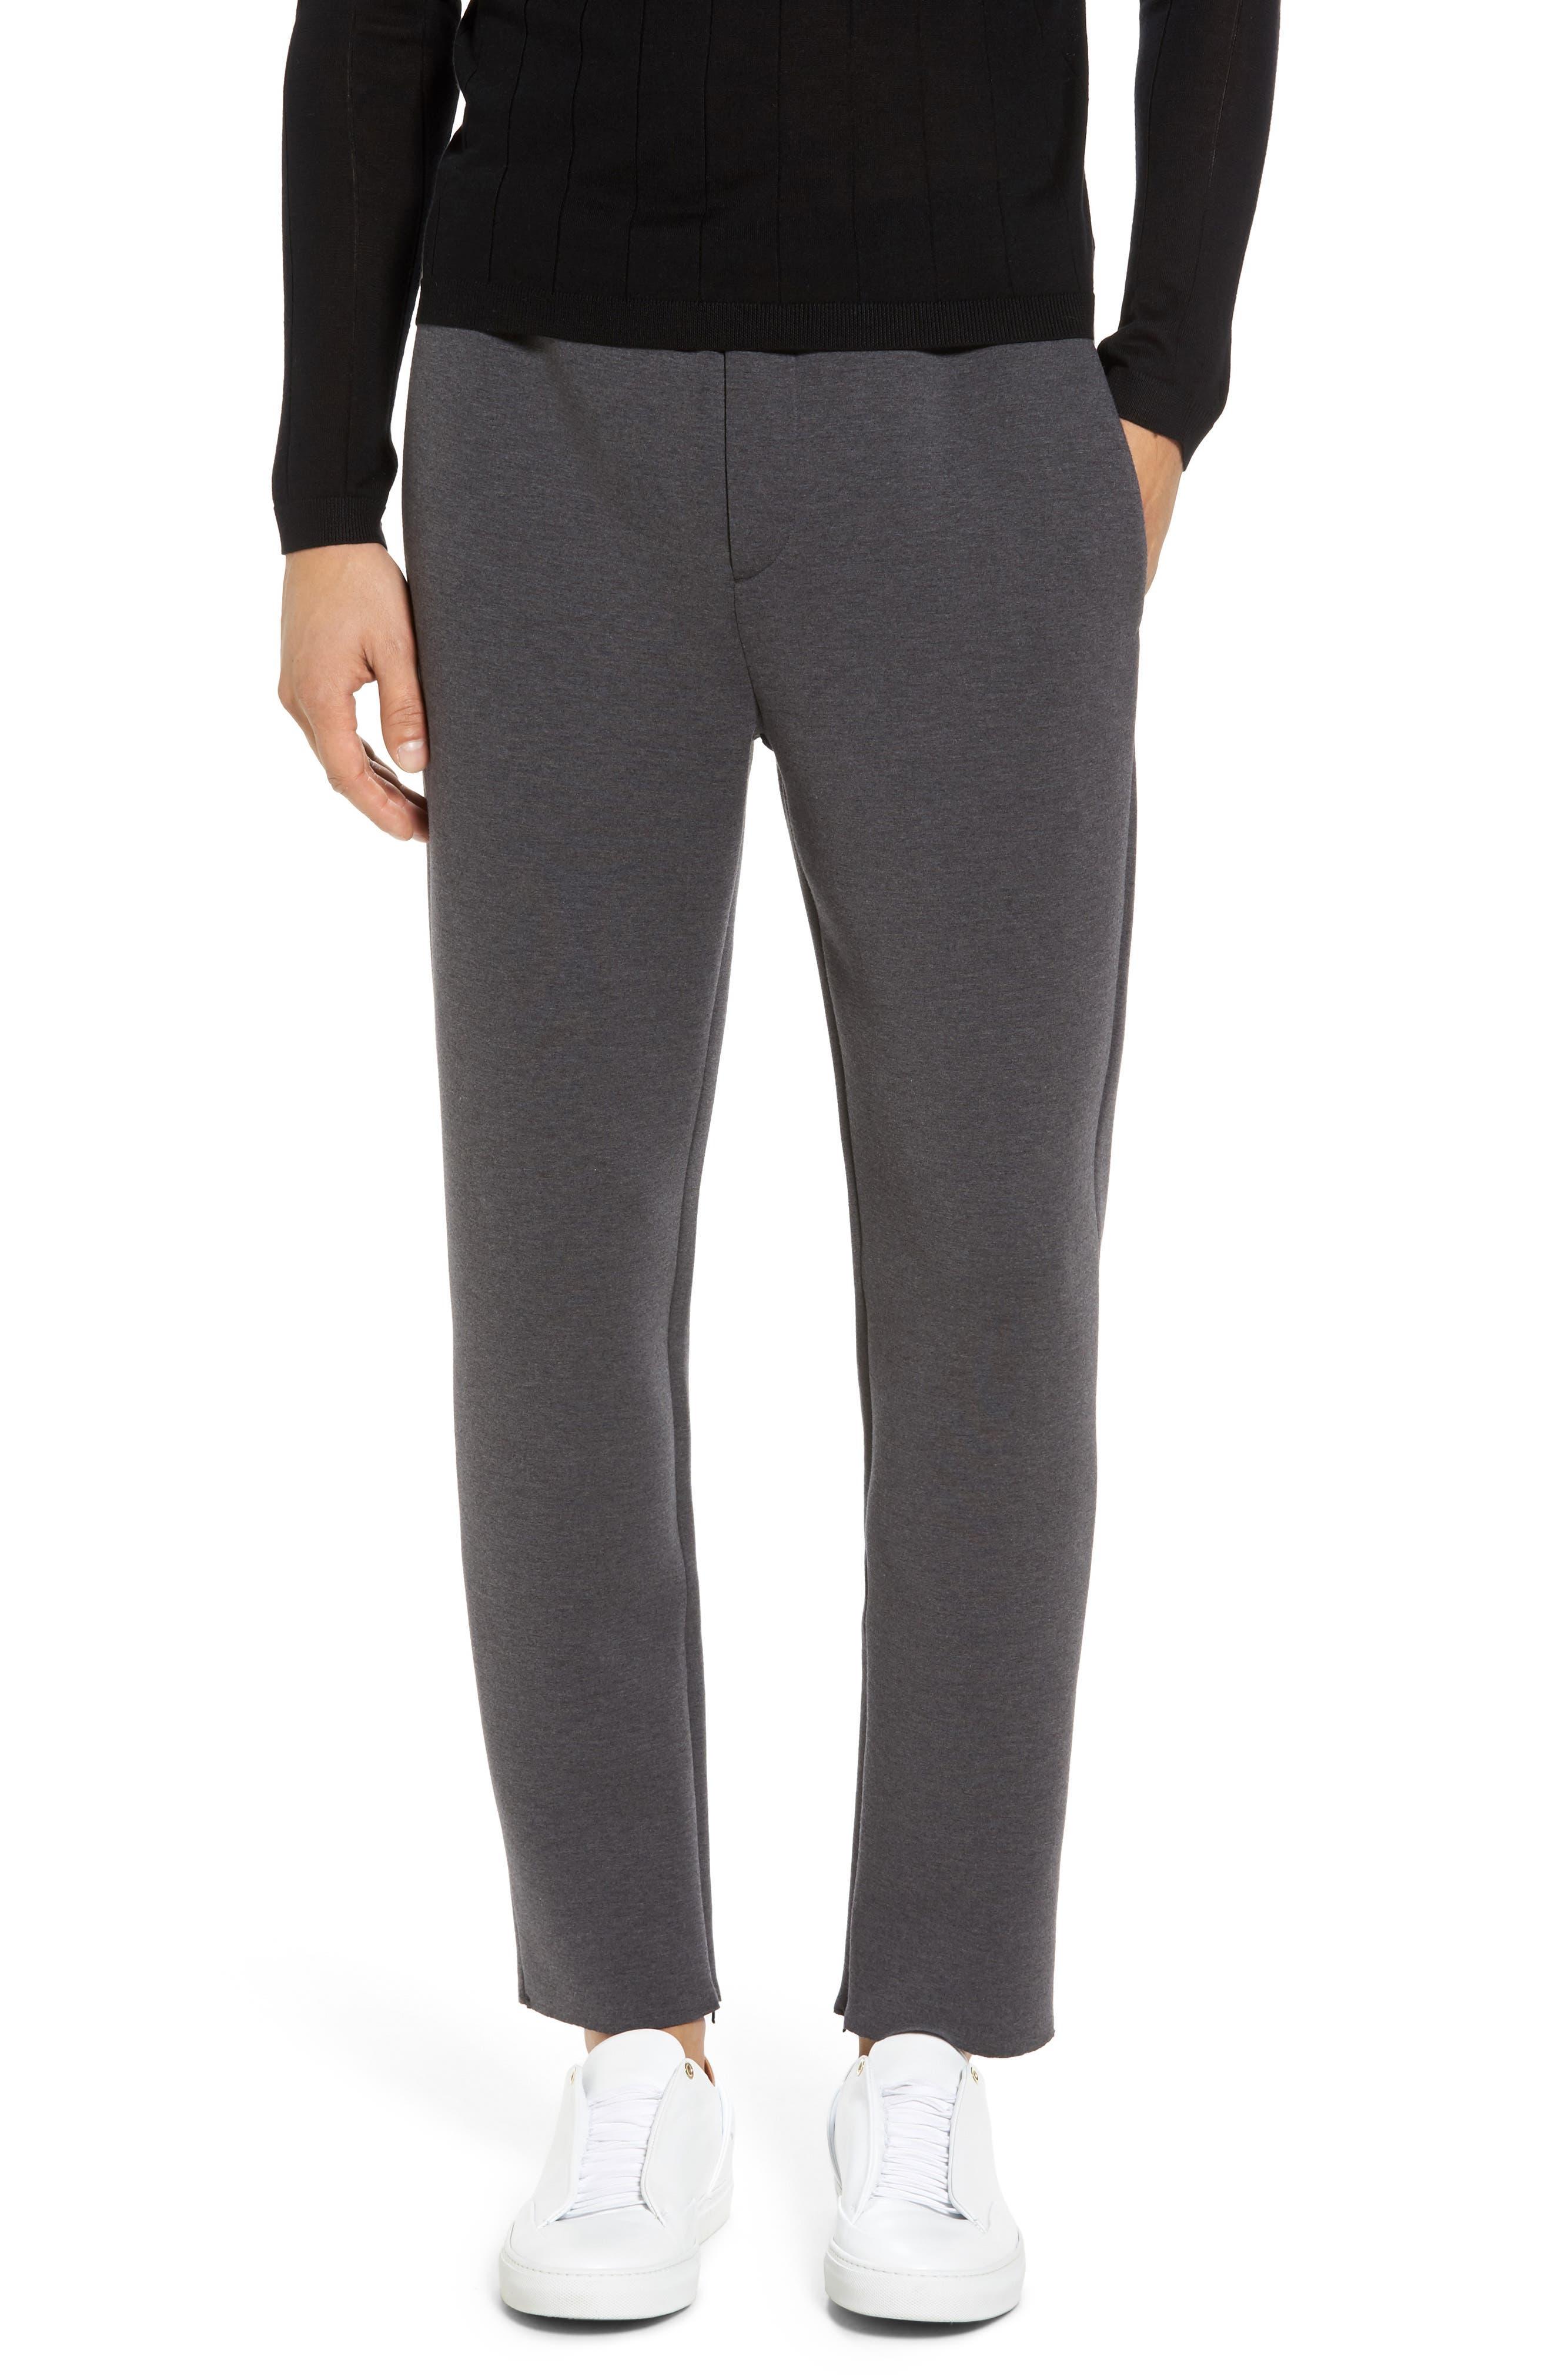 Knit Lounge Pants,                             Main thumbnail 1, color,                             Charcoal Heather